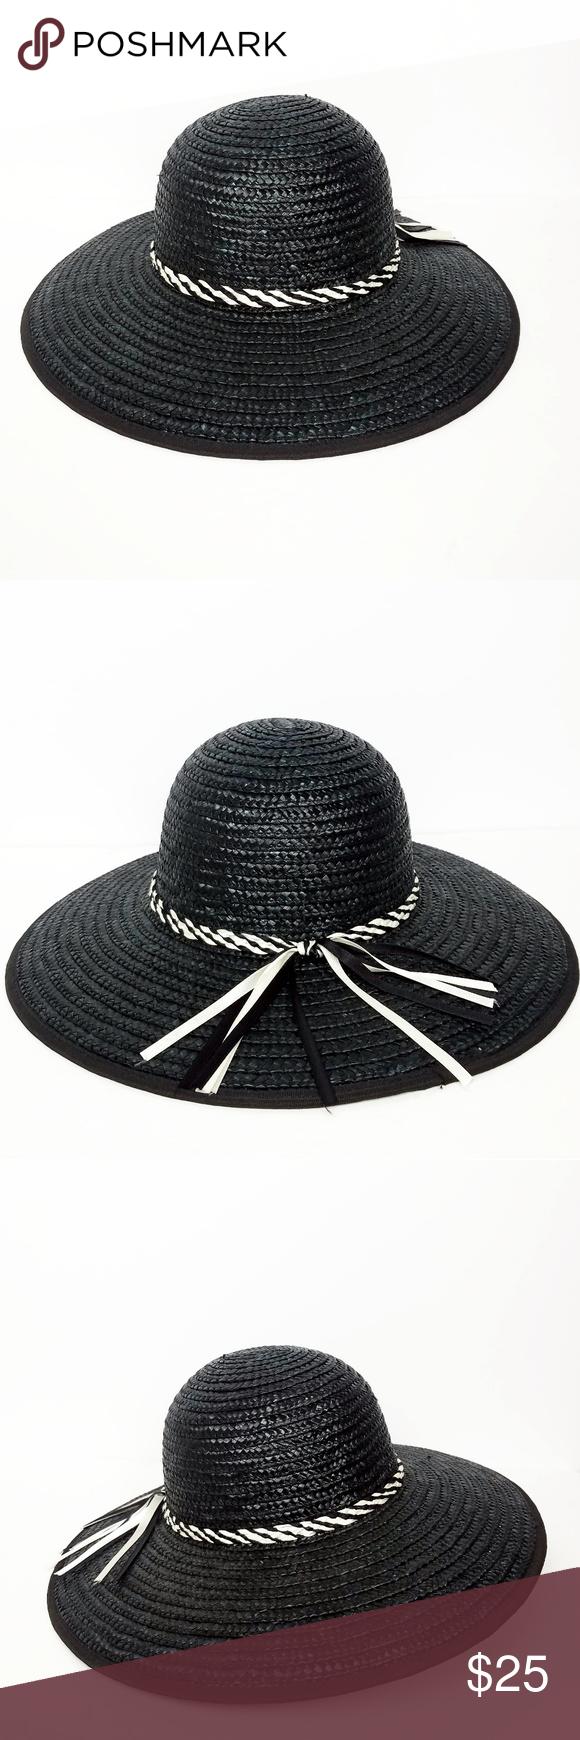 Nwot Hand Made Black And White Big Sun Hat Big Sun Hat Sun Hats Black And White